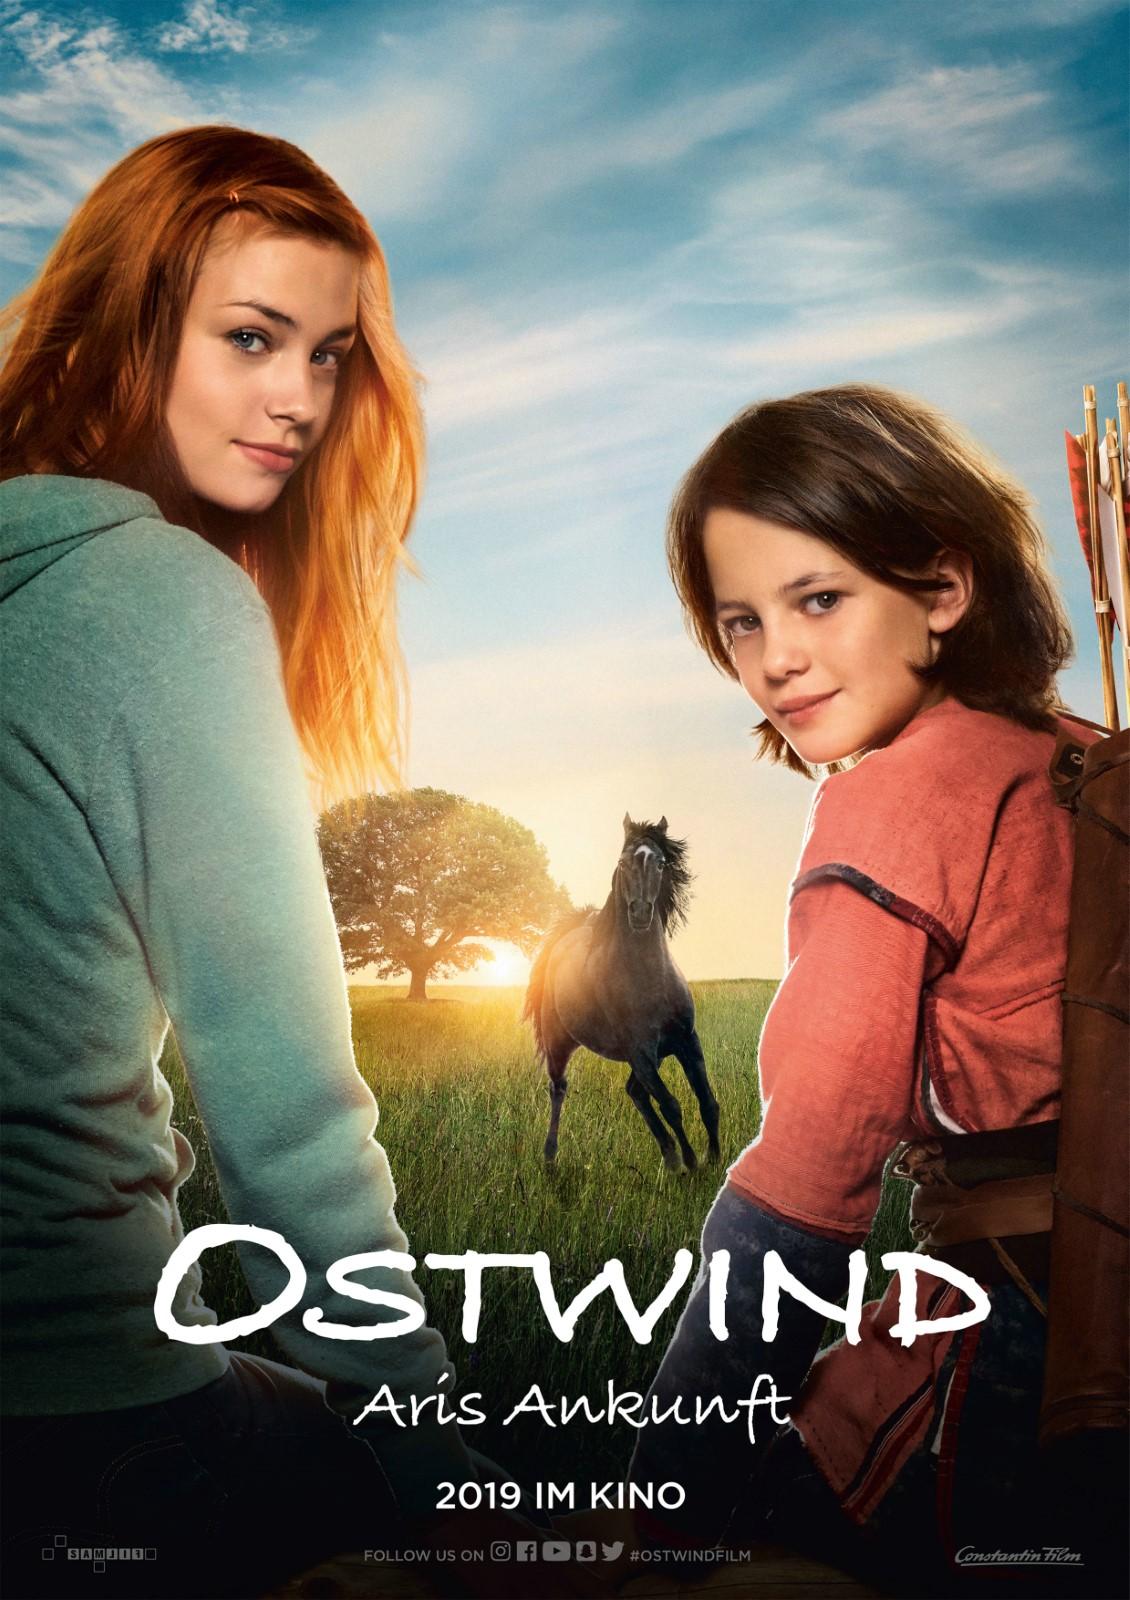 Ostwind 4 Film